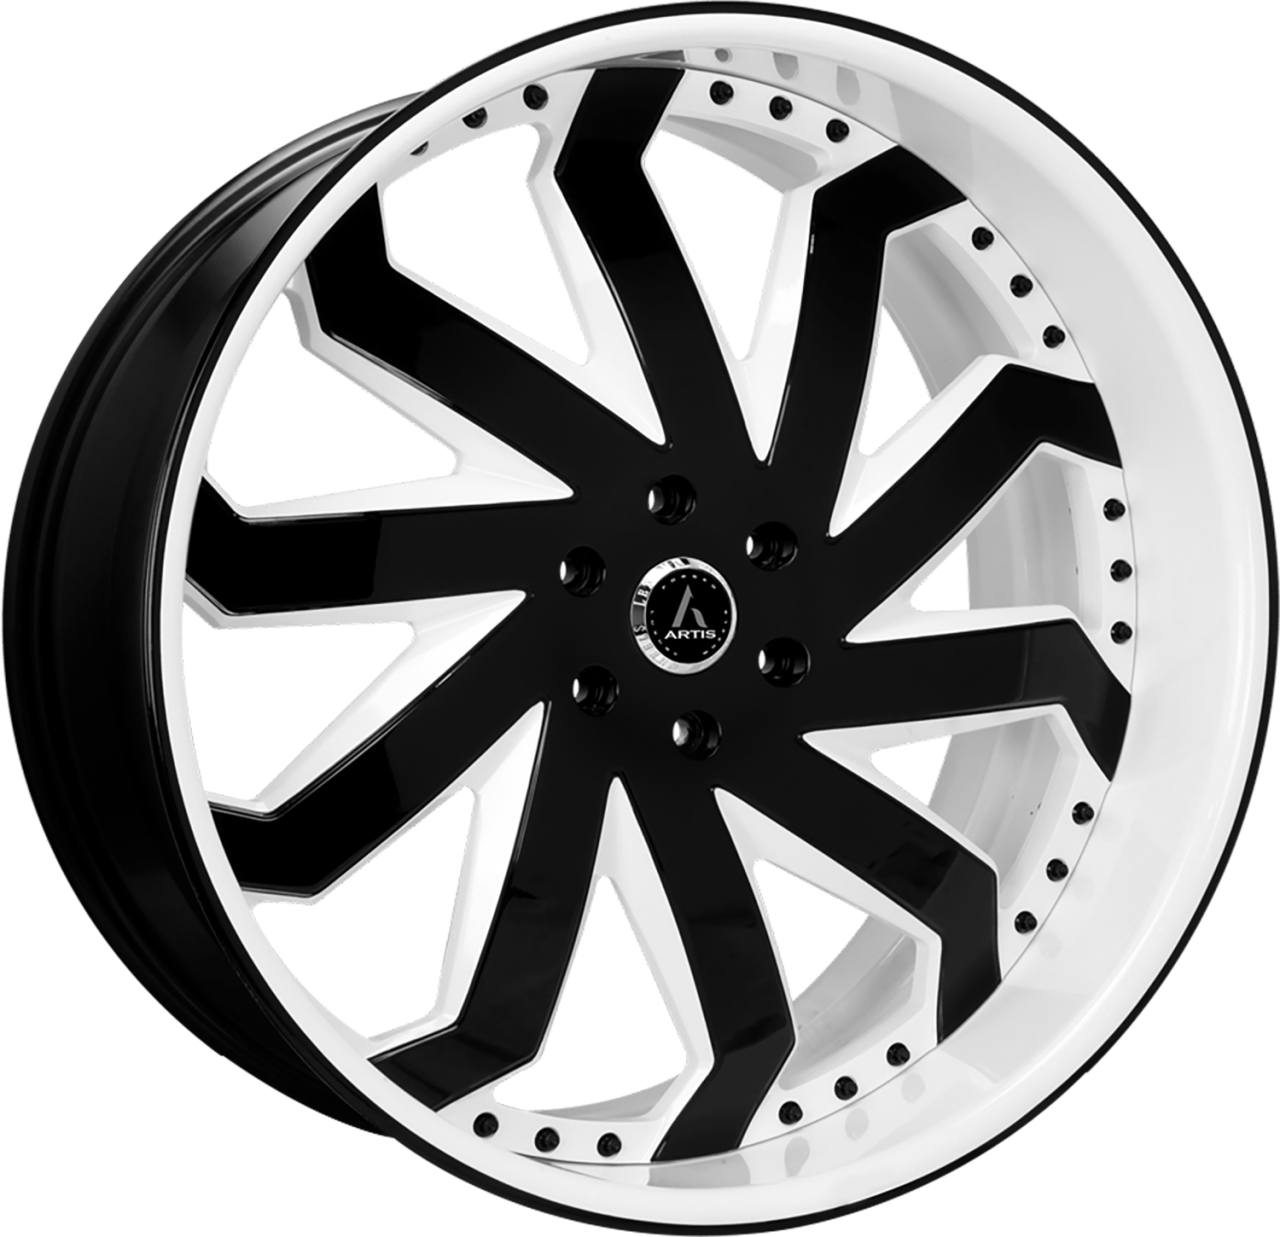 Artis Forged Rain wheel with Custom Black and White finish